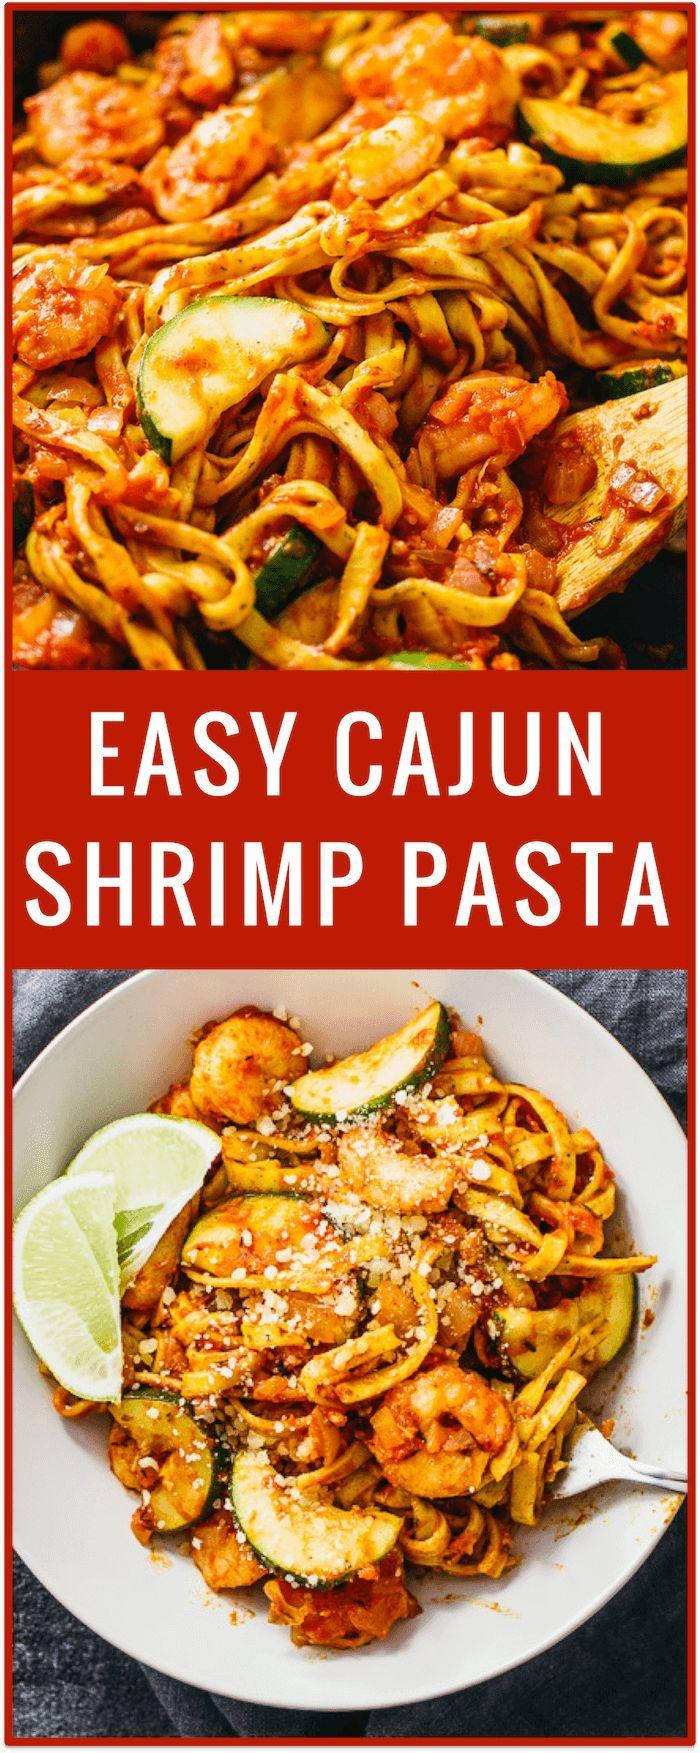 easy cajun shrimp pasta, spicy shrimp pasta, cajun chicken, cajun sausage pasta, creamy, simple, spaghetti, easy recipe, pasta dinner via /savory_tooth/